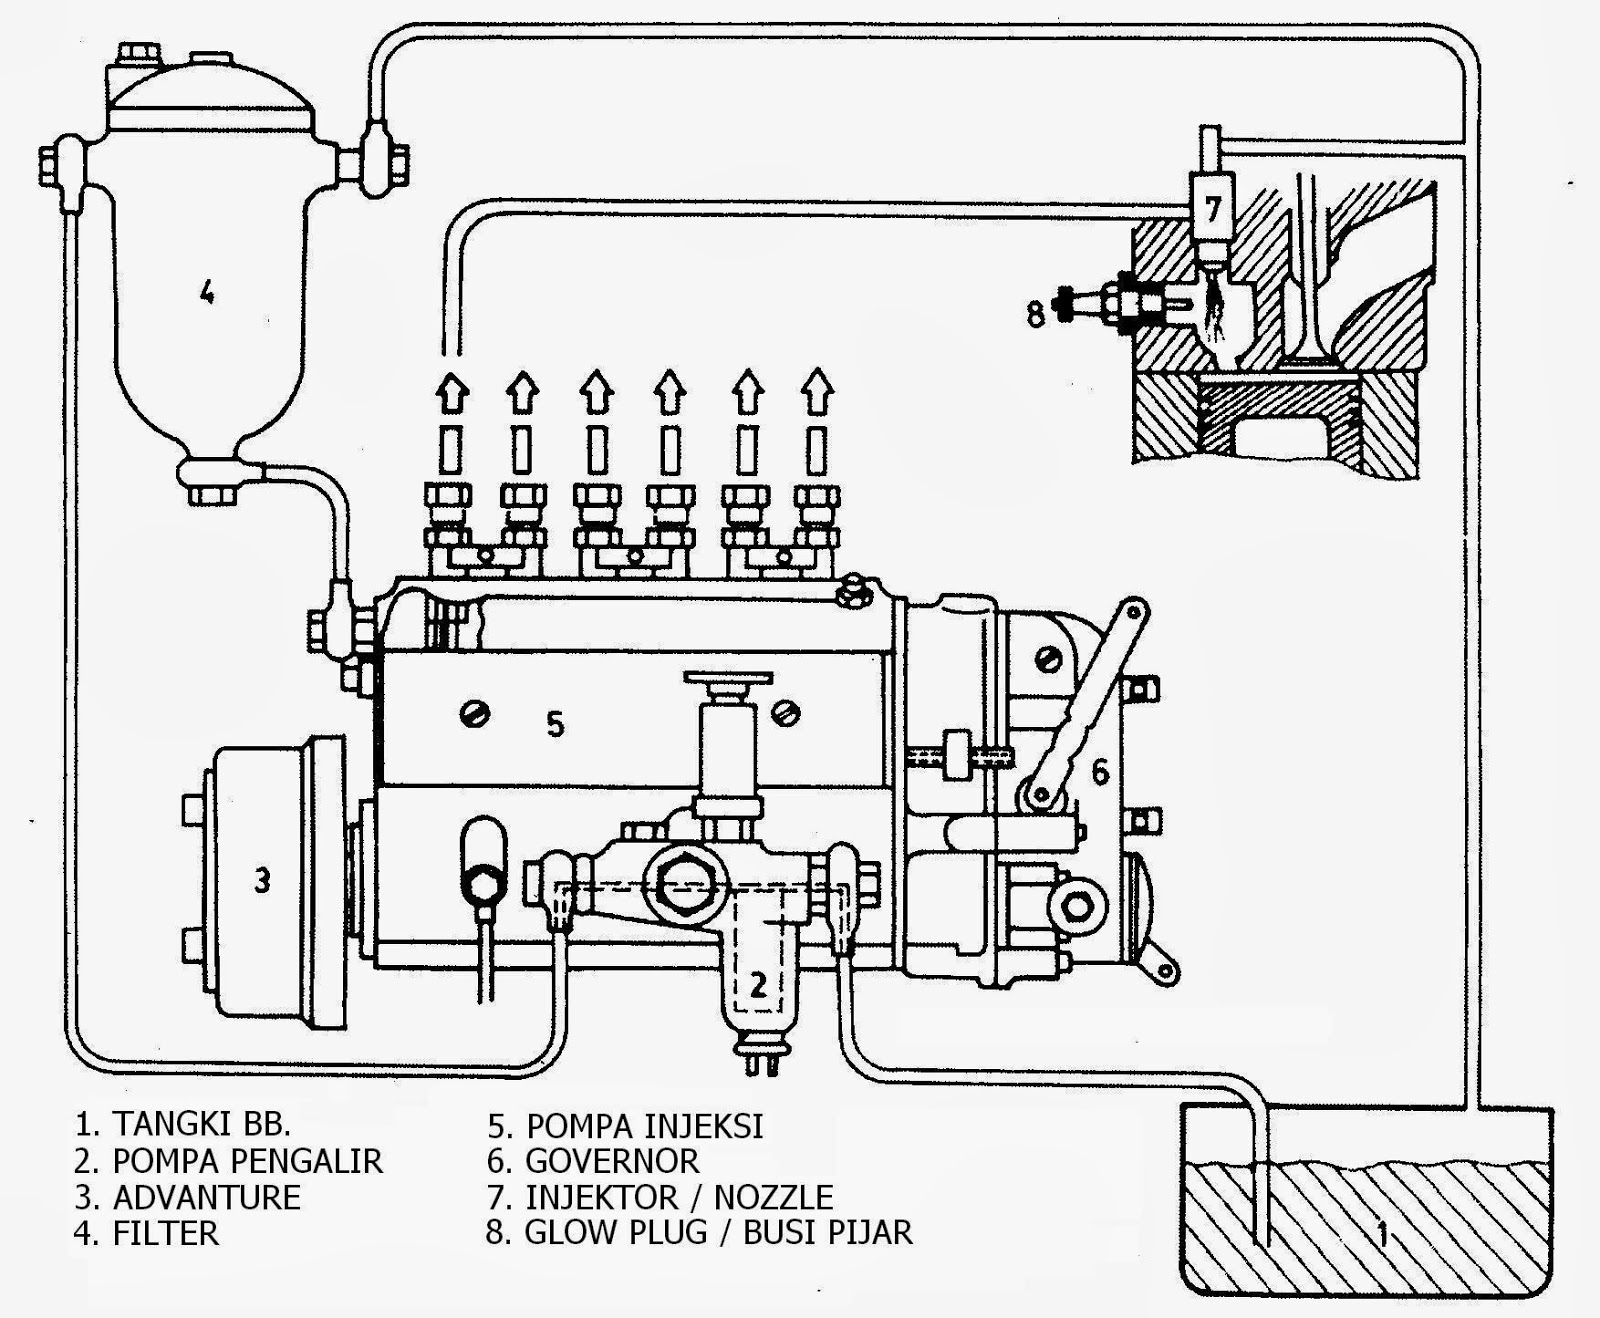 medium resolution of 04 hyundai elantra fuse box diagram hyundai auto wiring 2003 hyundai santa fe audio wiring diagram 2000 hyundai tiburon wiring schematic